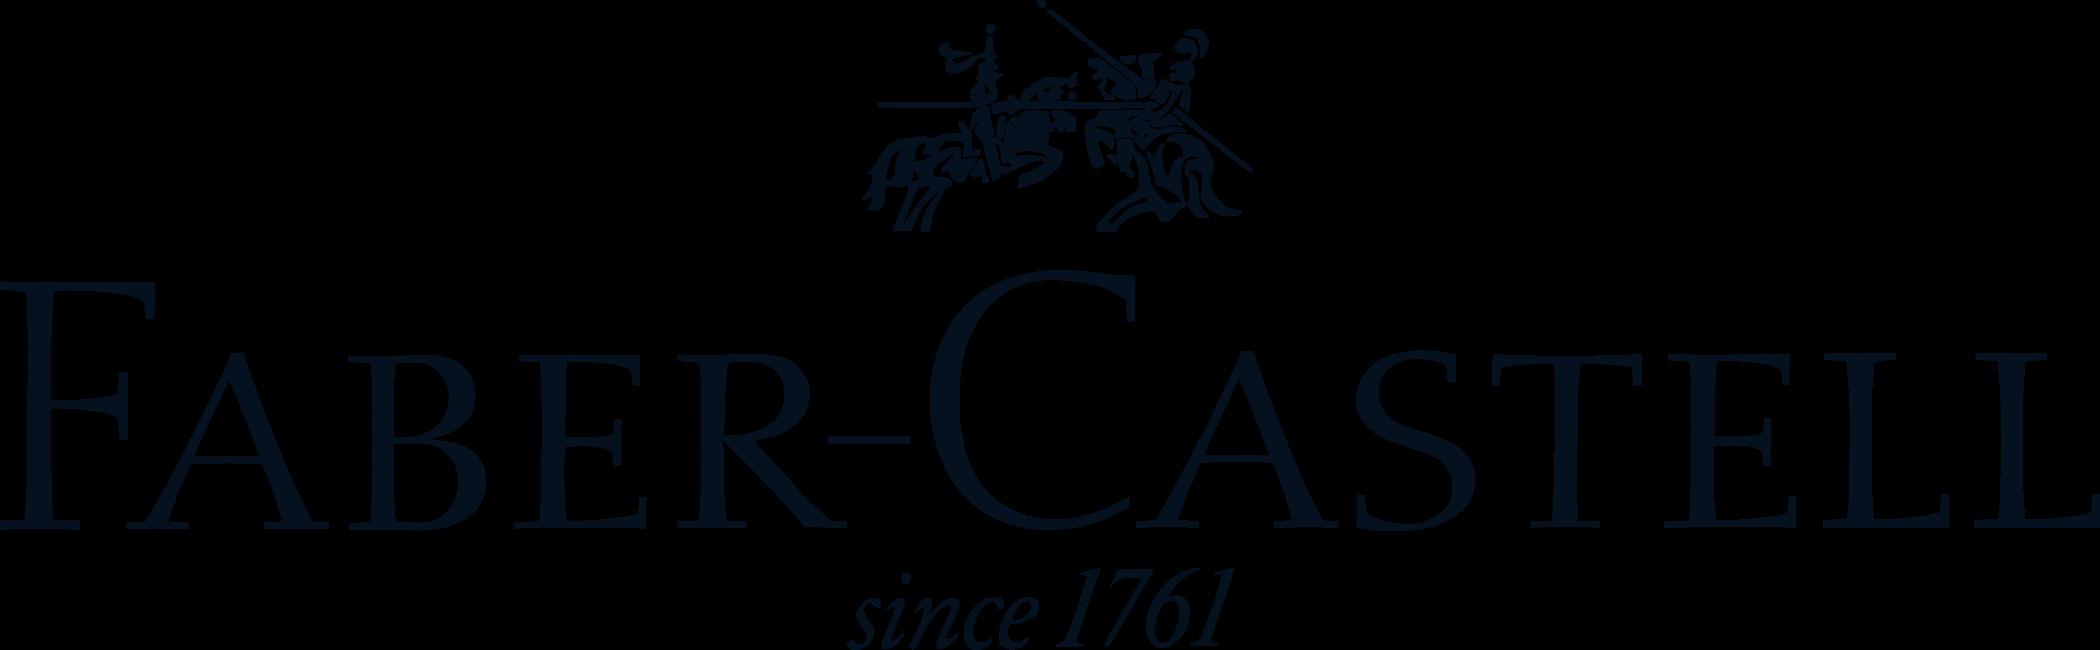 Faber Castell Logo.